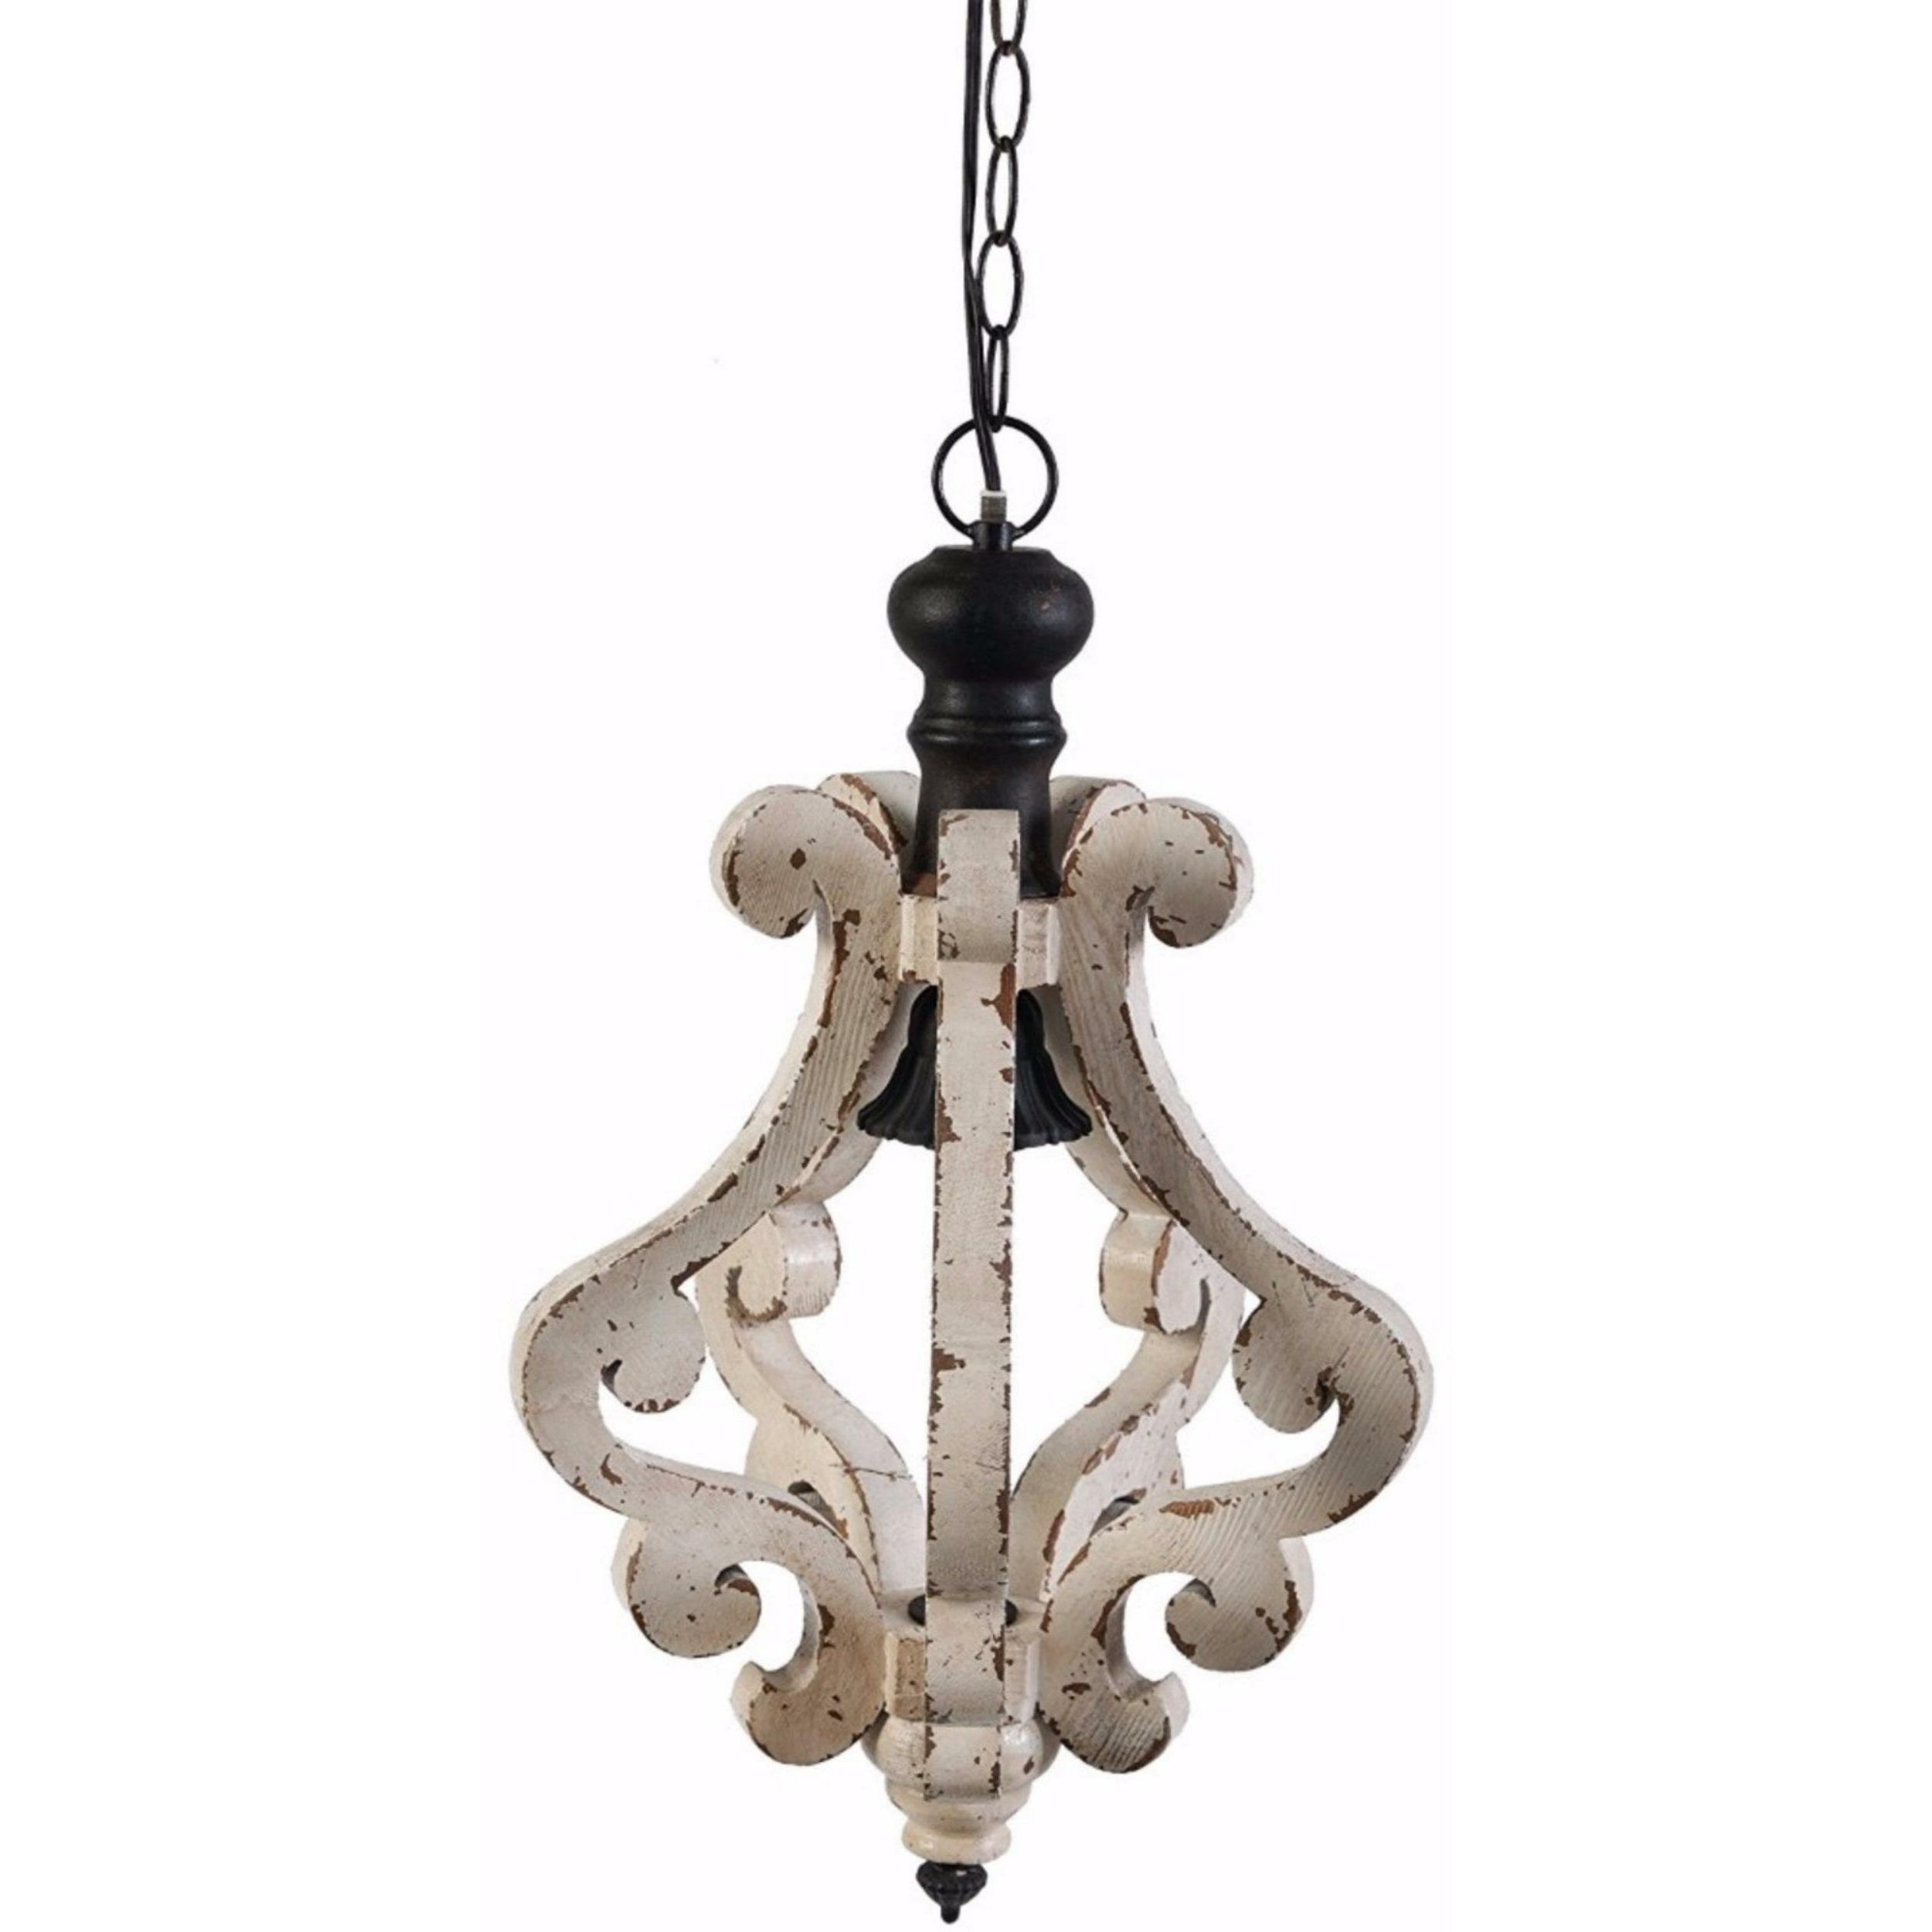 Latonia Wooden 1 Light Single Geometric Pendant Throughout Favorite Grullon Scroll 1 Light Single Bell Pendants (View 11 of 20)